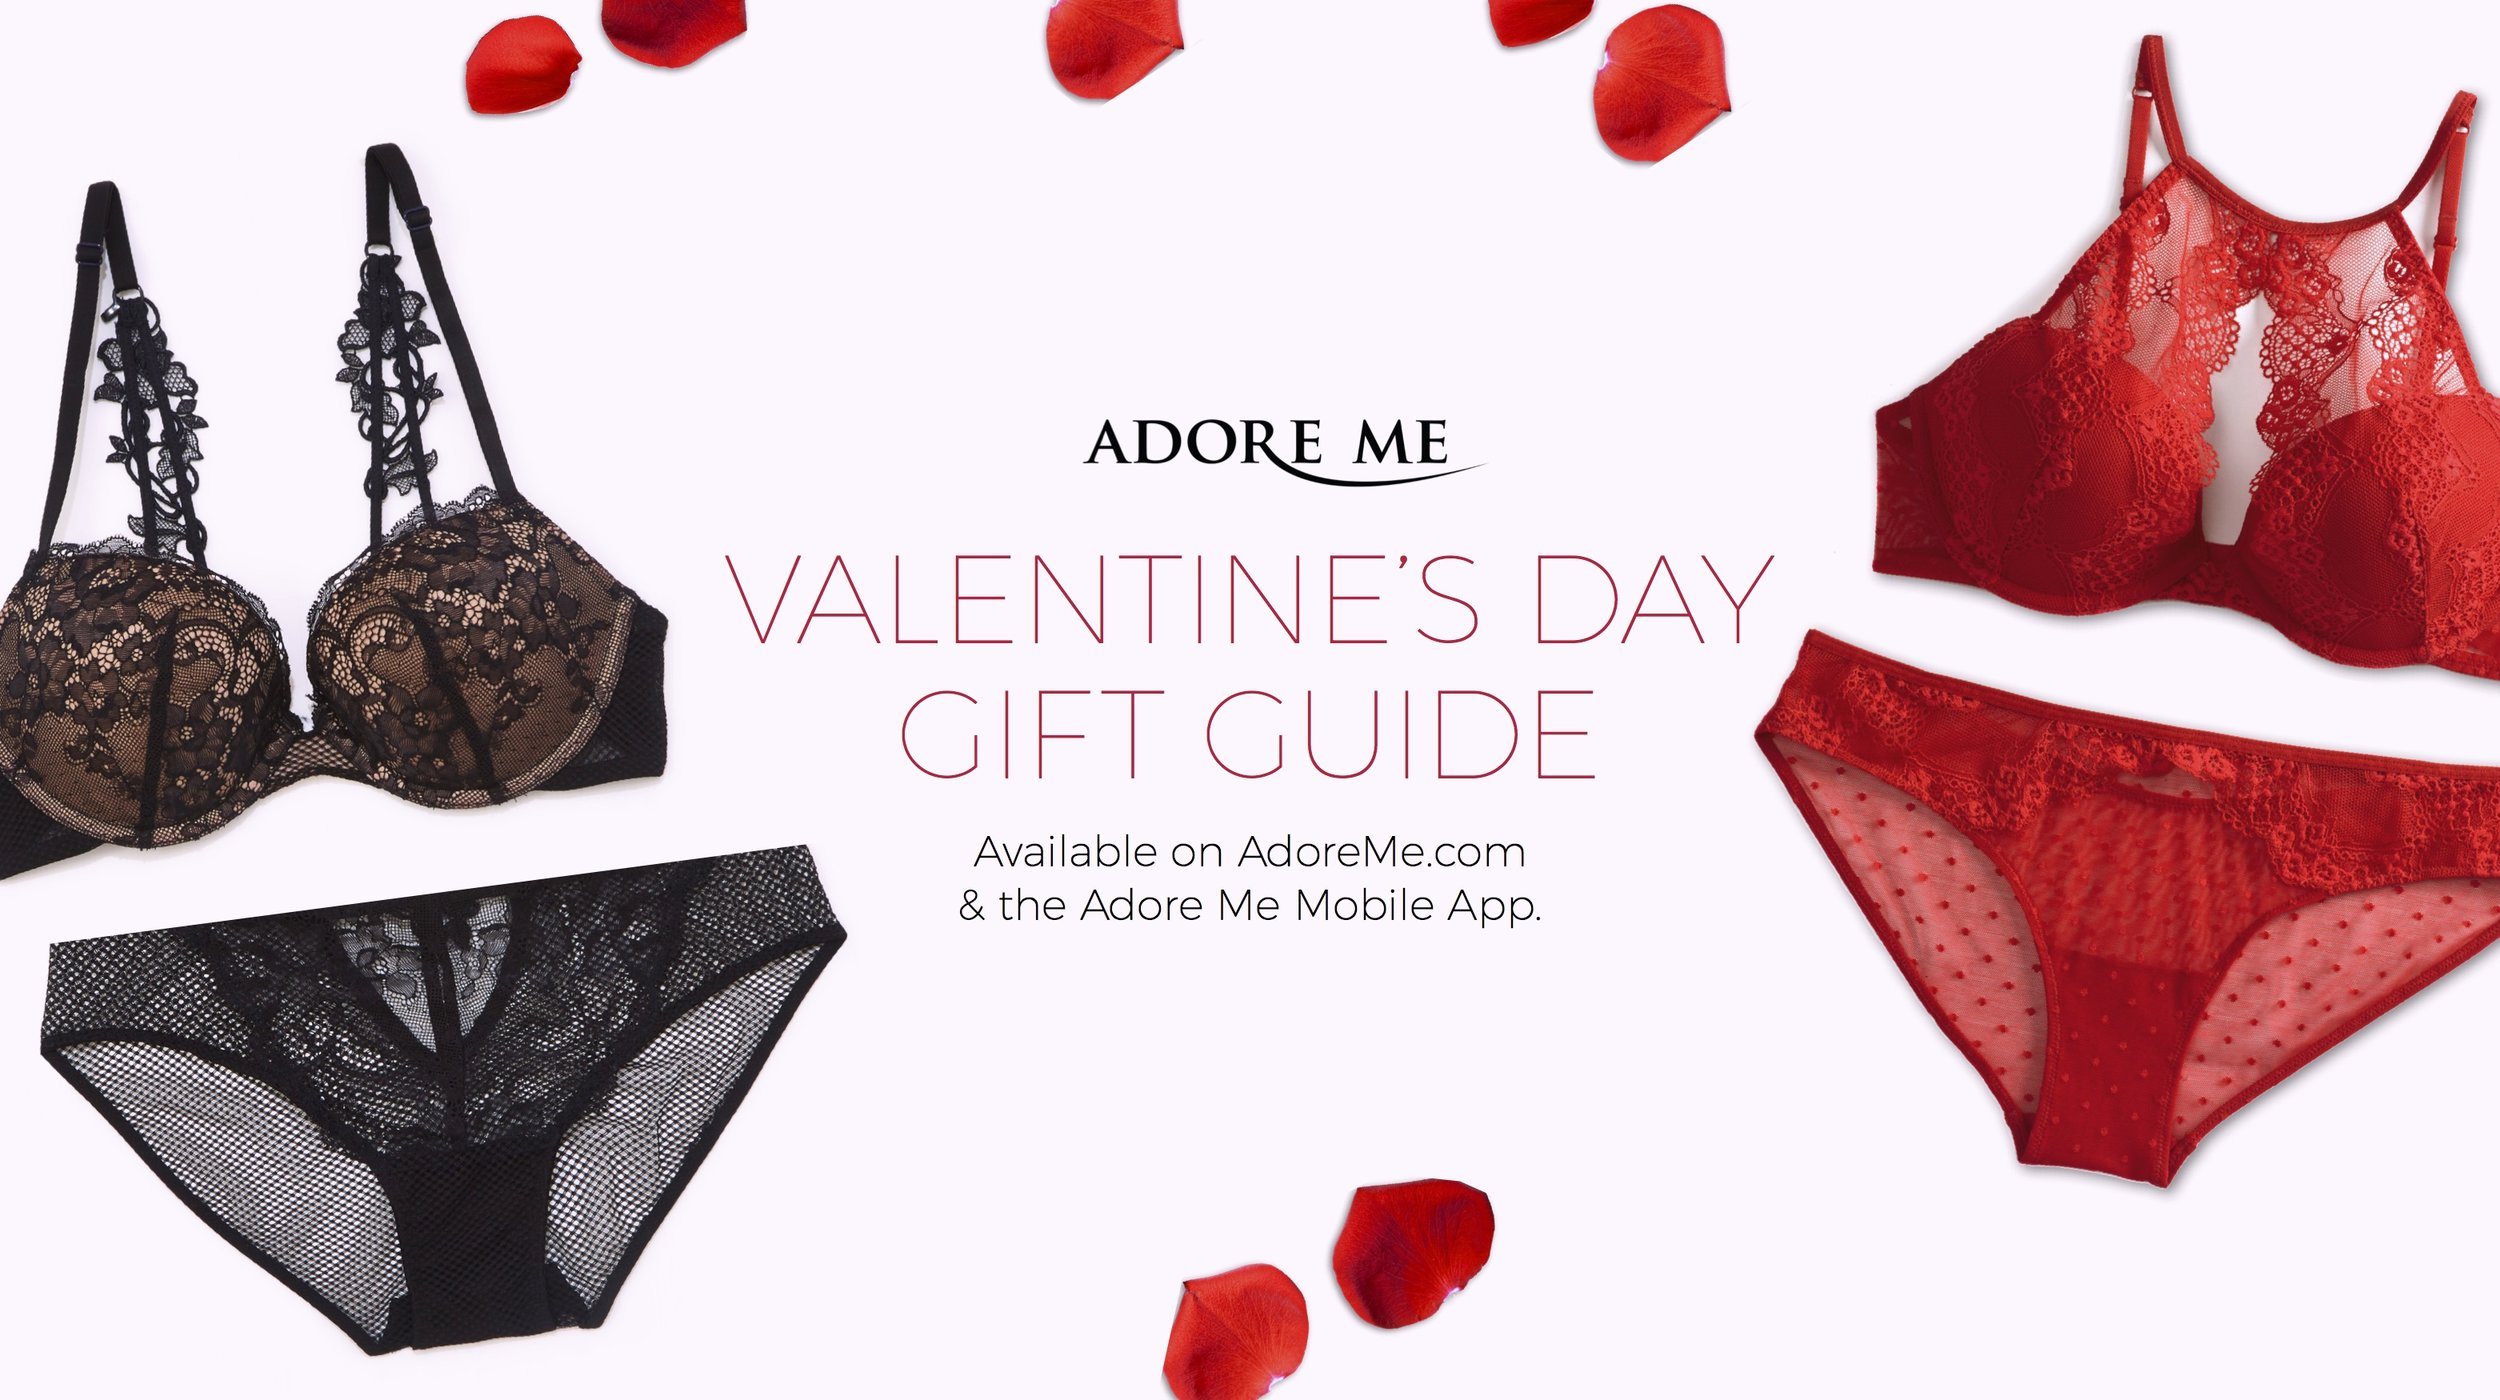 Adore Me Valentine's Day 2018 1.jpg